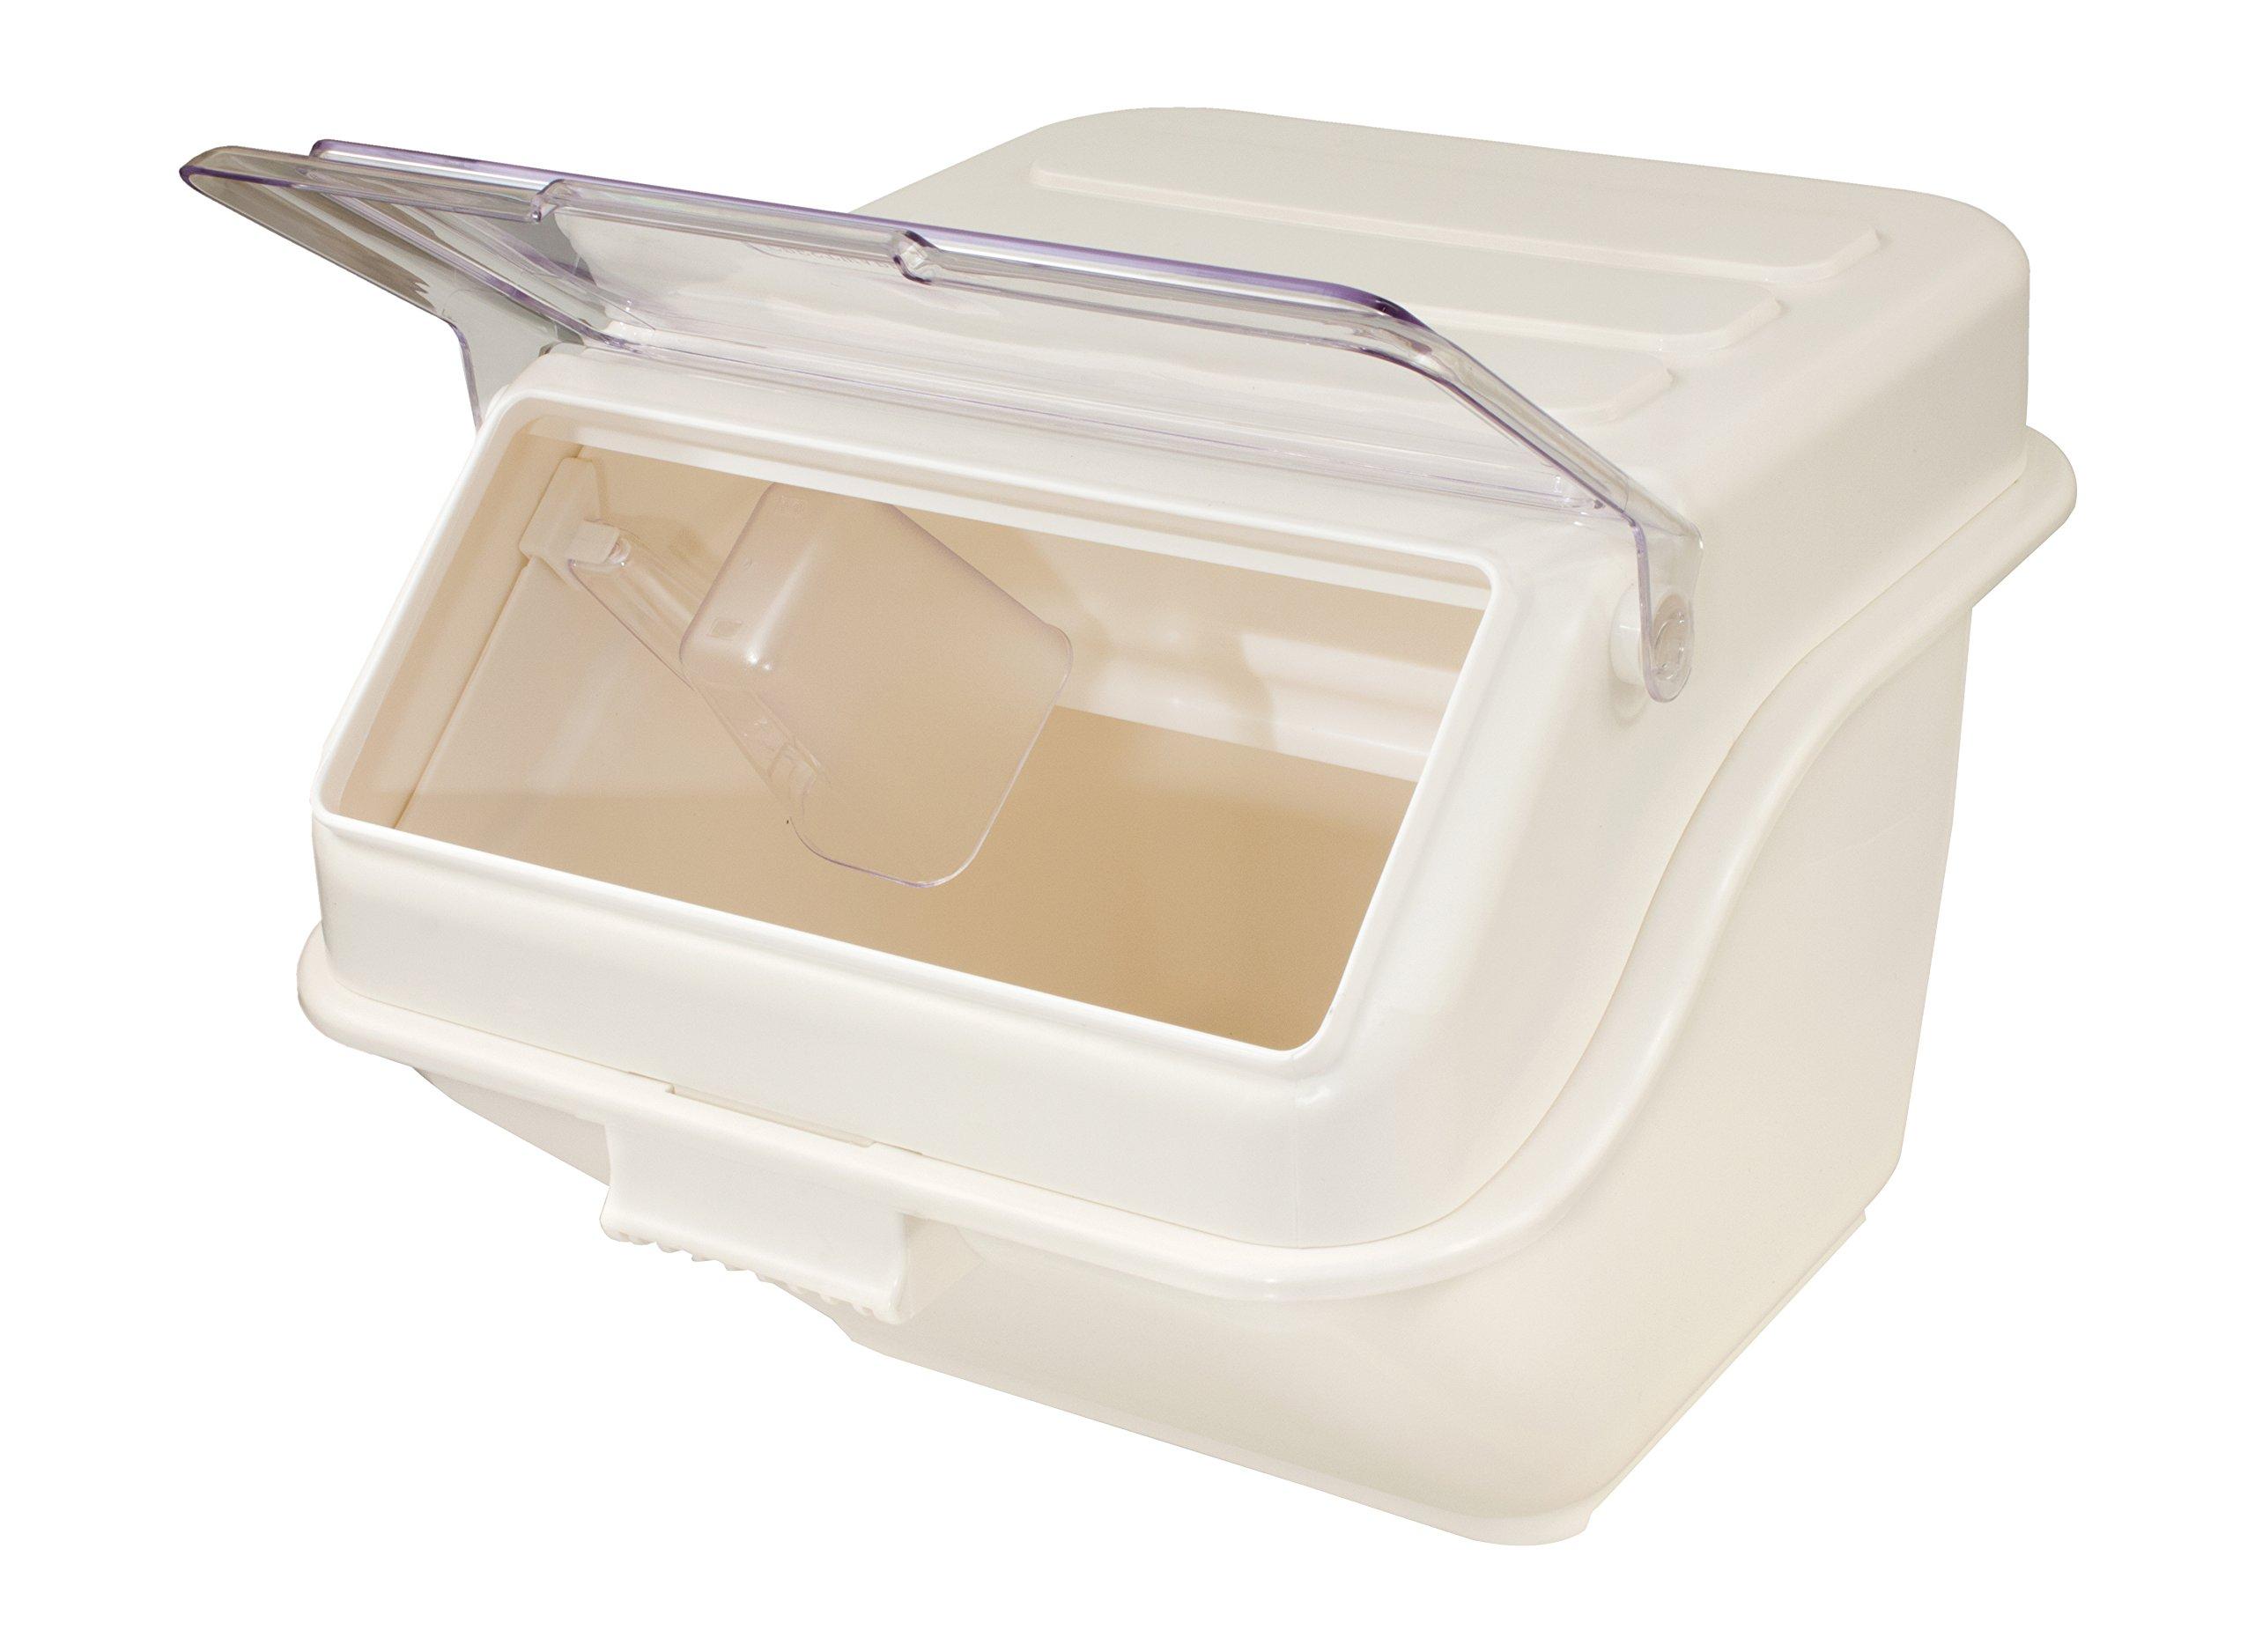 Crestware IN10 Shelf Ingredient Bin, 10 gallon, Beige